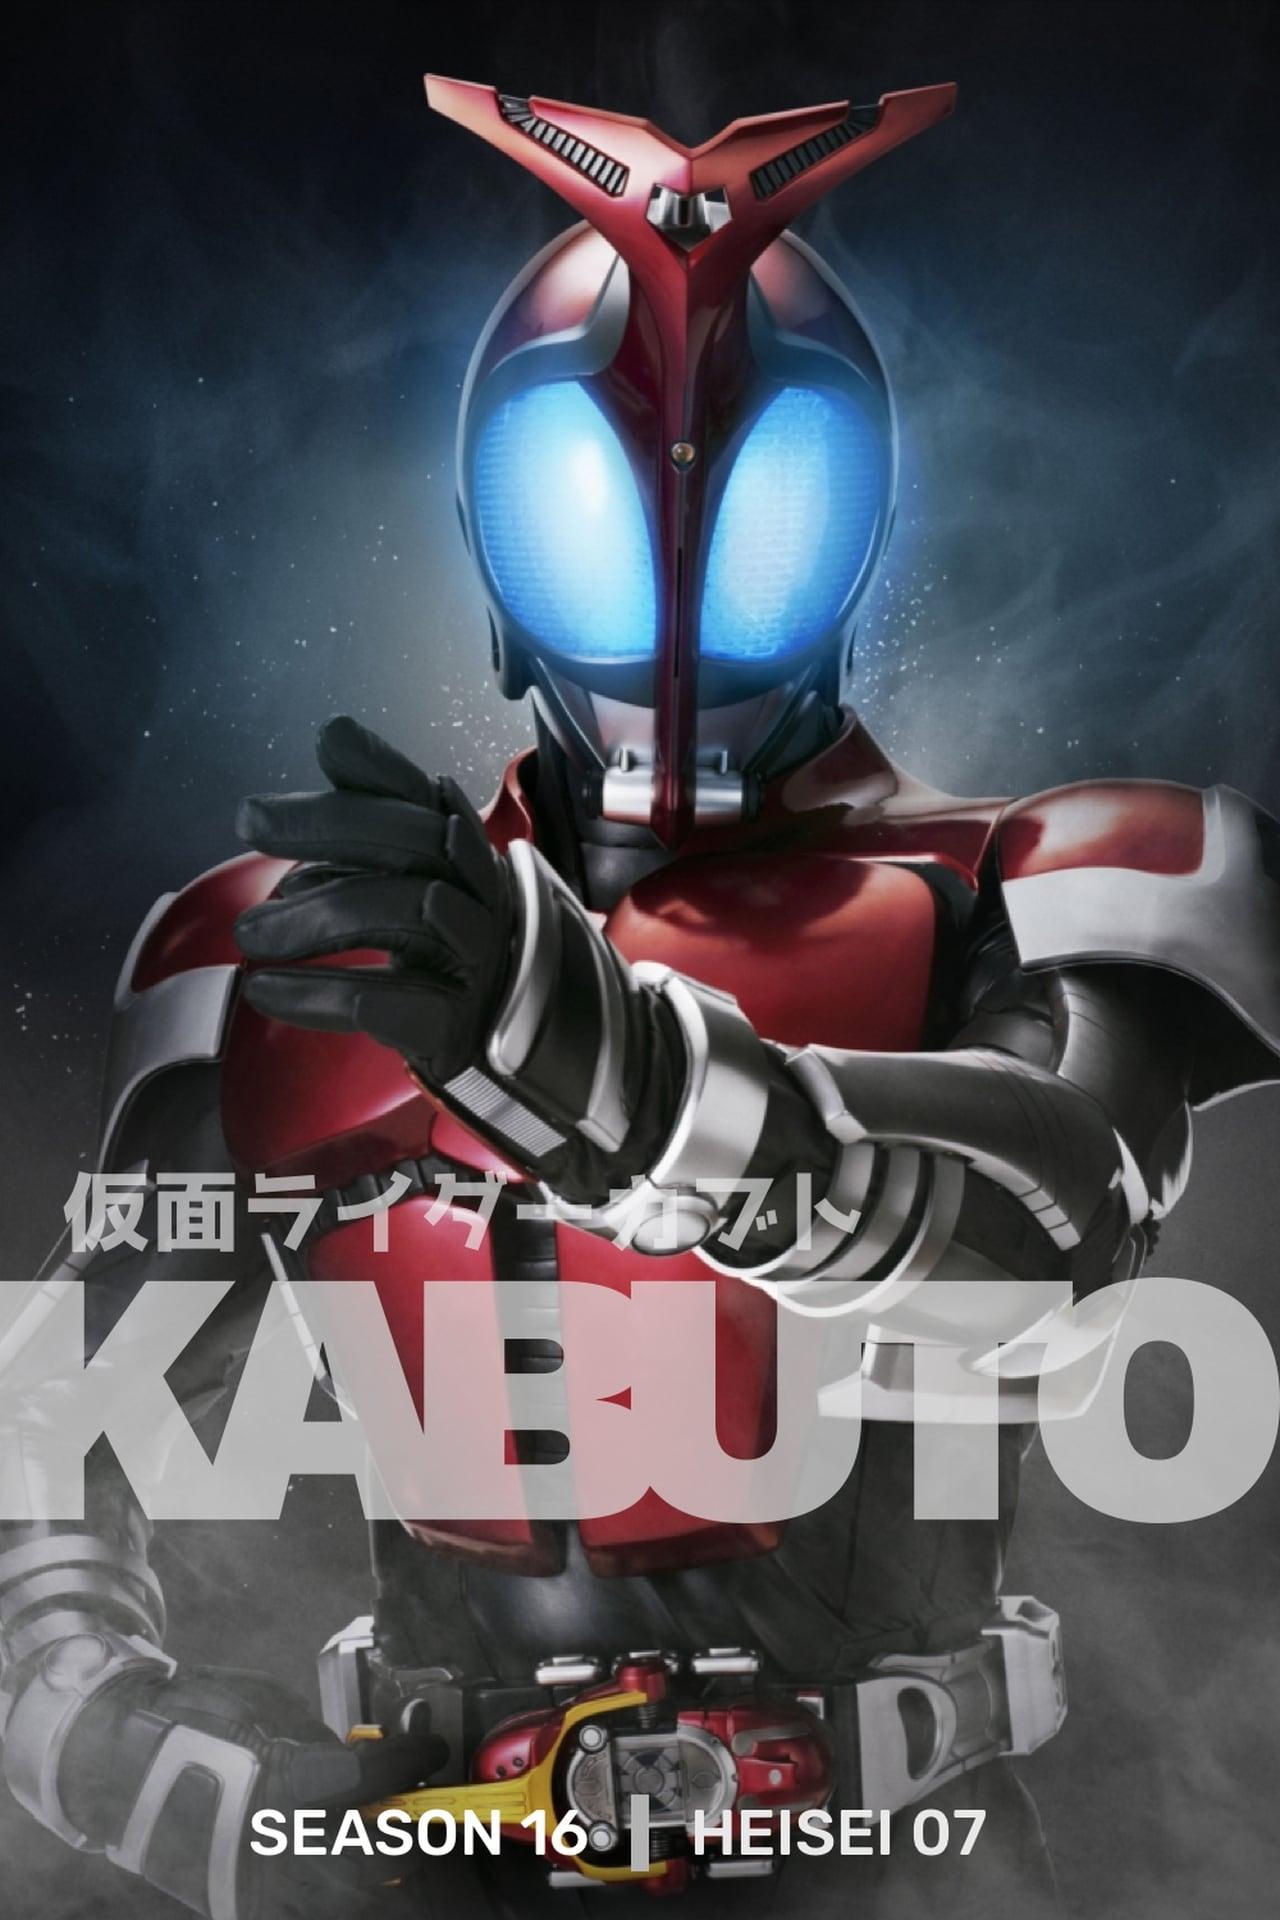 Putlocker Kamen Rider Season 16 (2006)